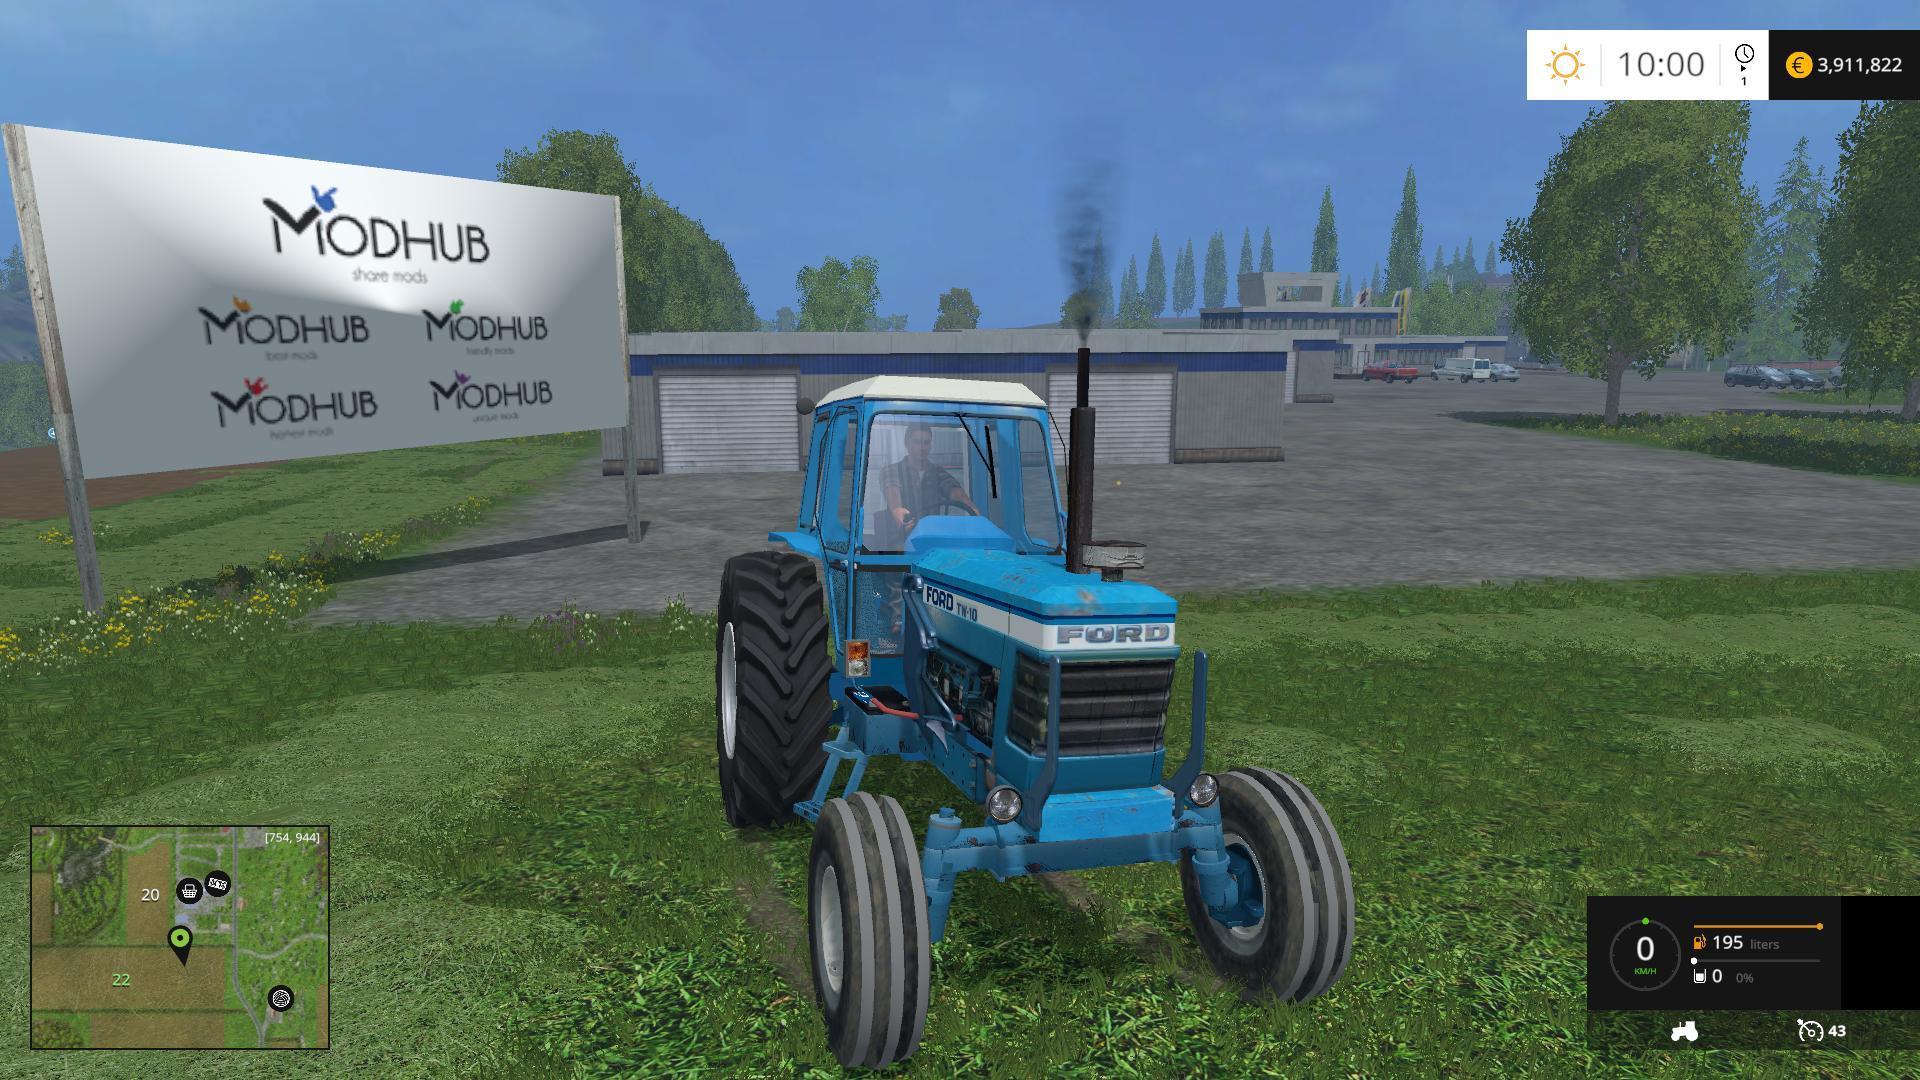 10 Archives • Farming simulator 19, 17, 15 mods | FS19, 17